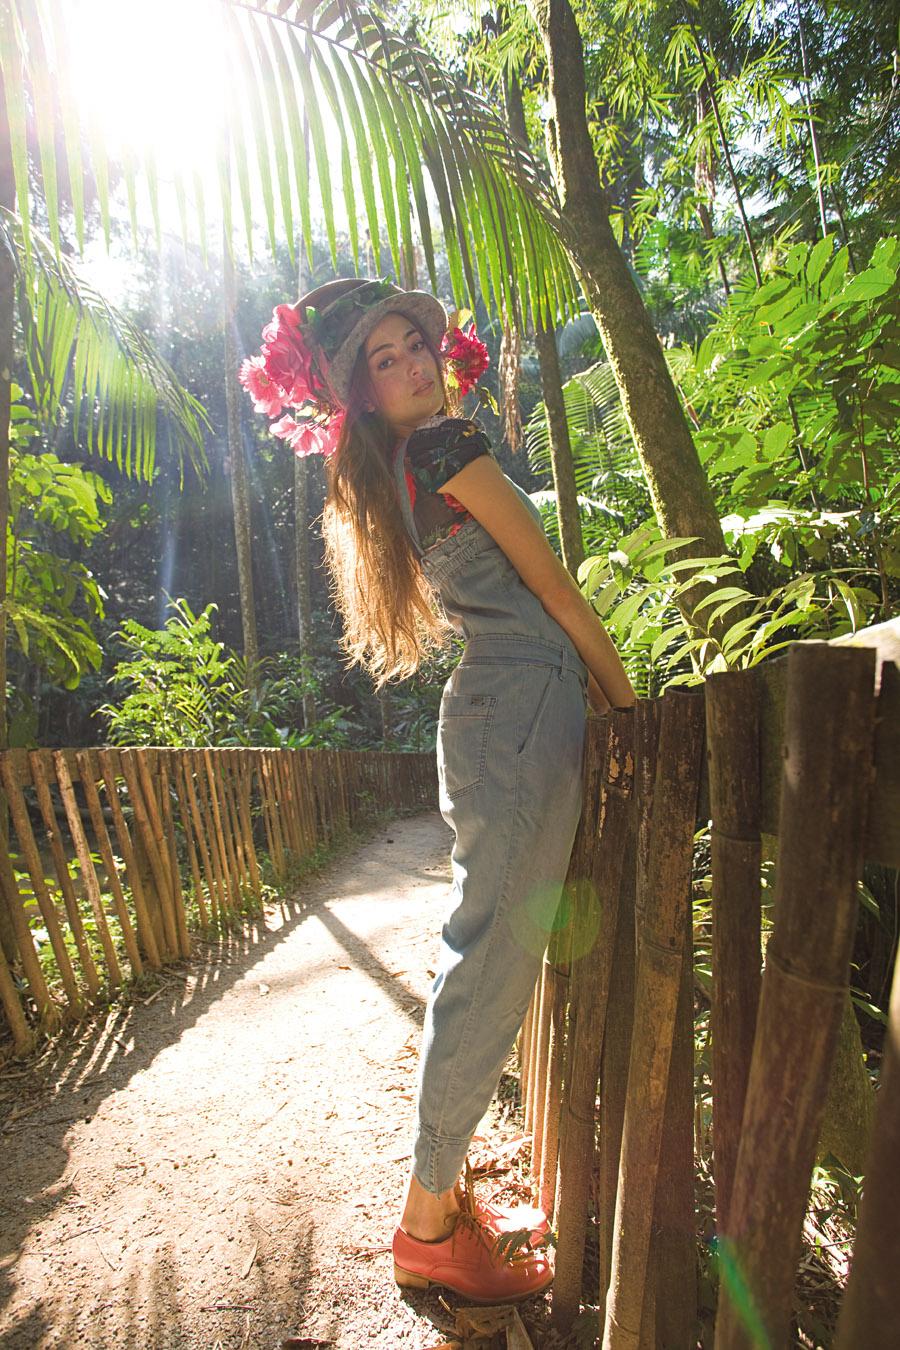 chapéu <b>Erika Ikezili</b> preço sob consulta,  blusa <b>Lucy in the Sky</b> R$ 105,  macacão <b>DTA</b> R$ 424,  sapato <b>Tabita</b> R$ 209